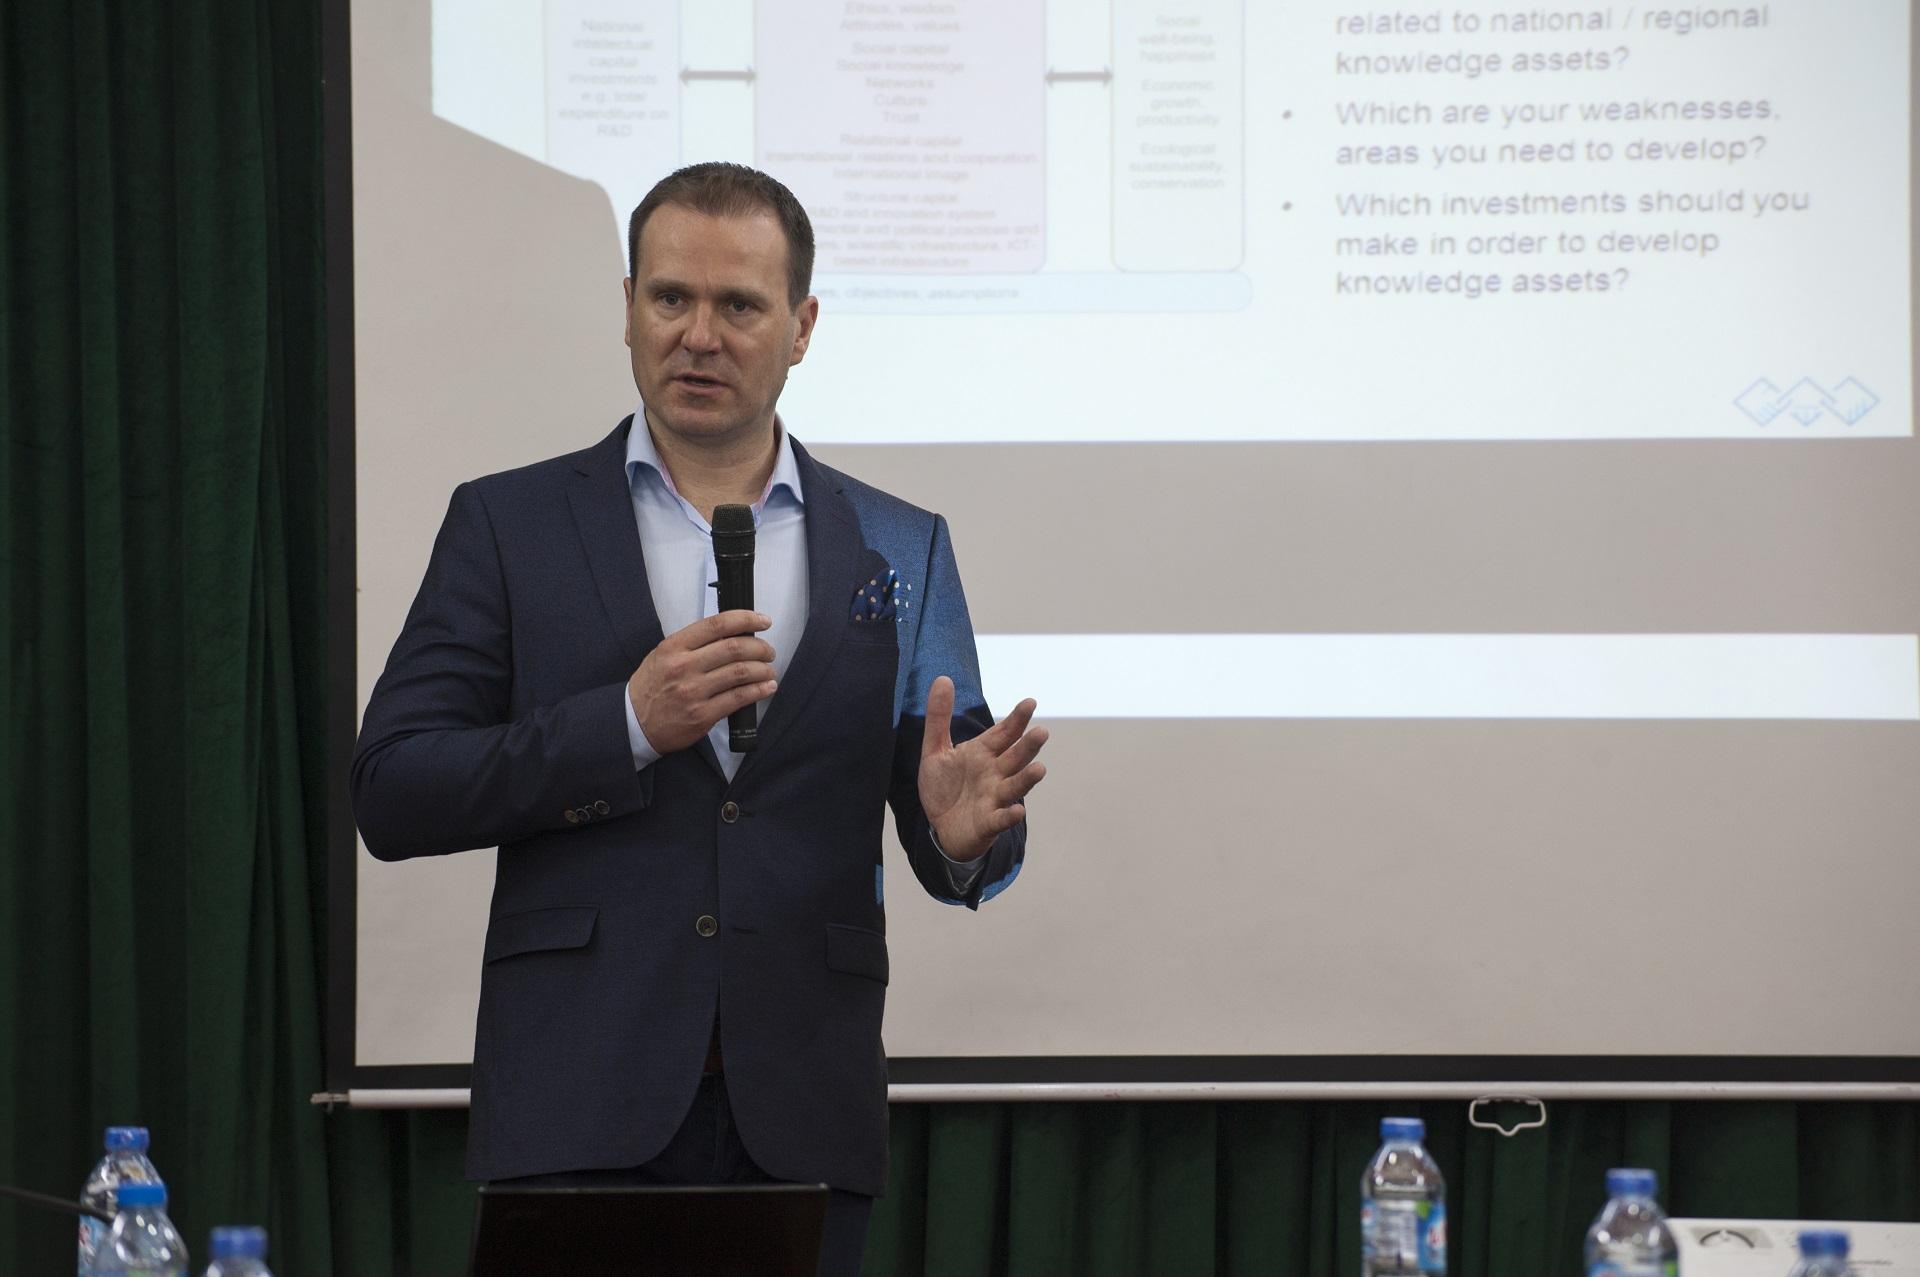 Professor Antti Lönnqvist, Dean of Management Faculty, University of Tampere.